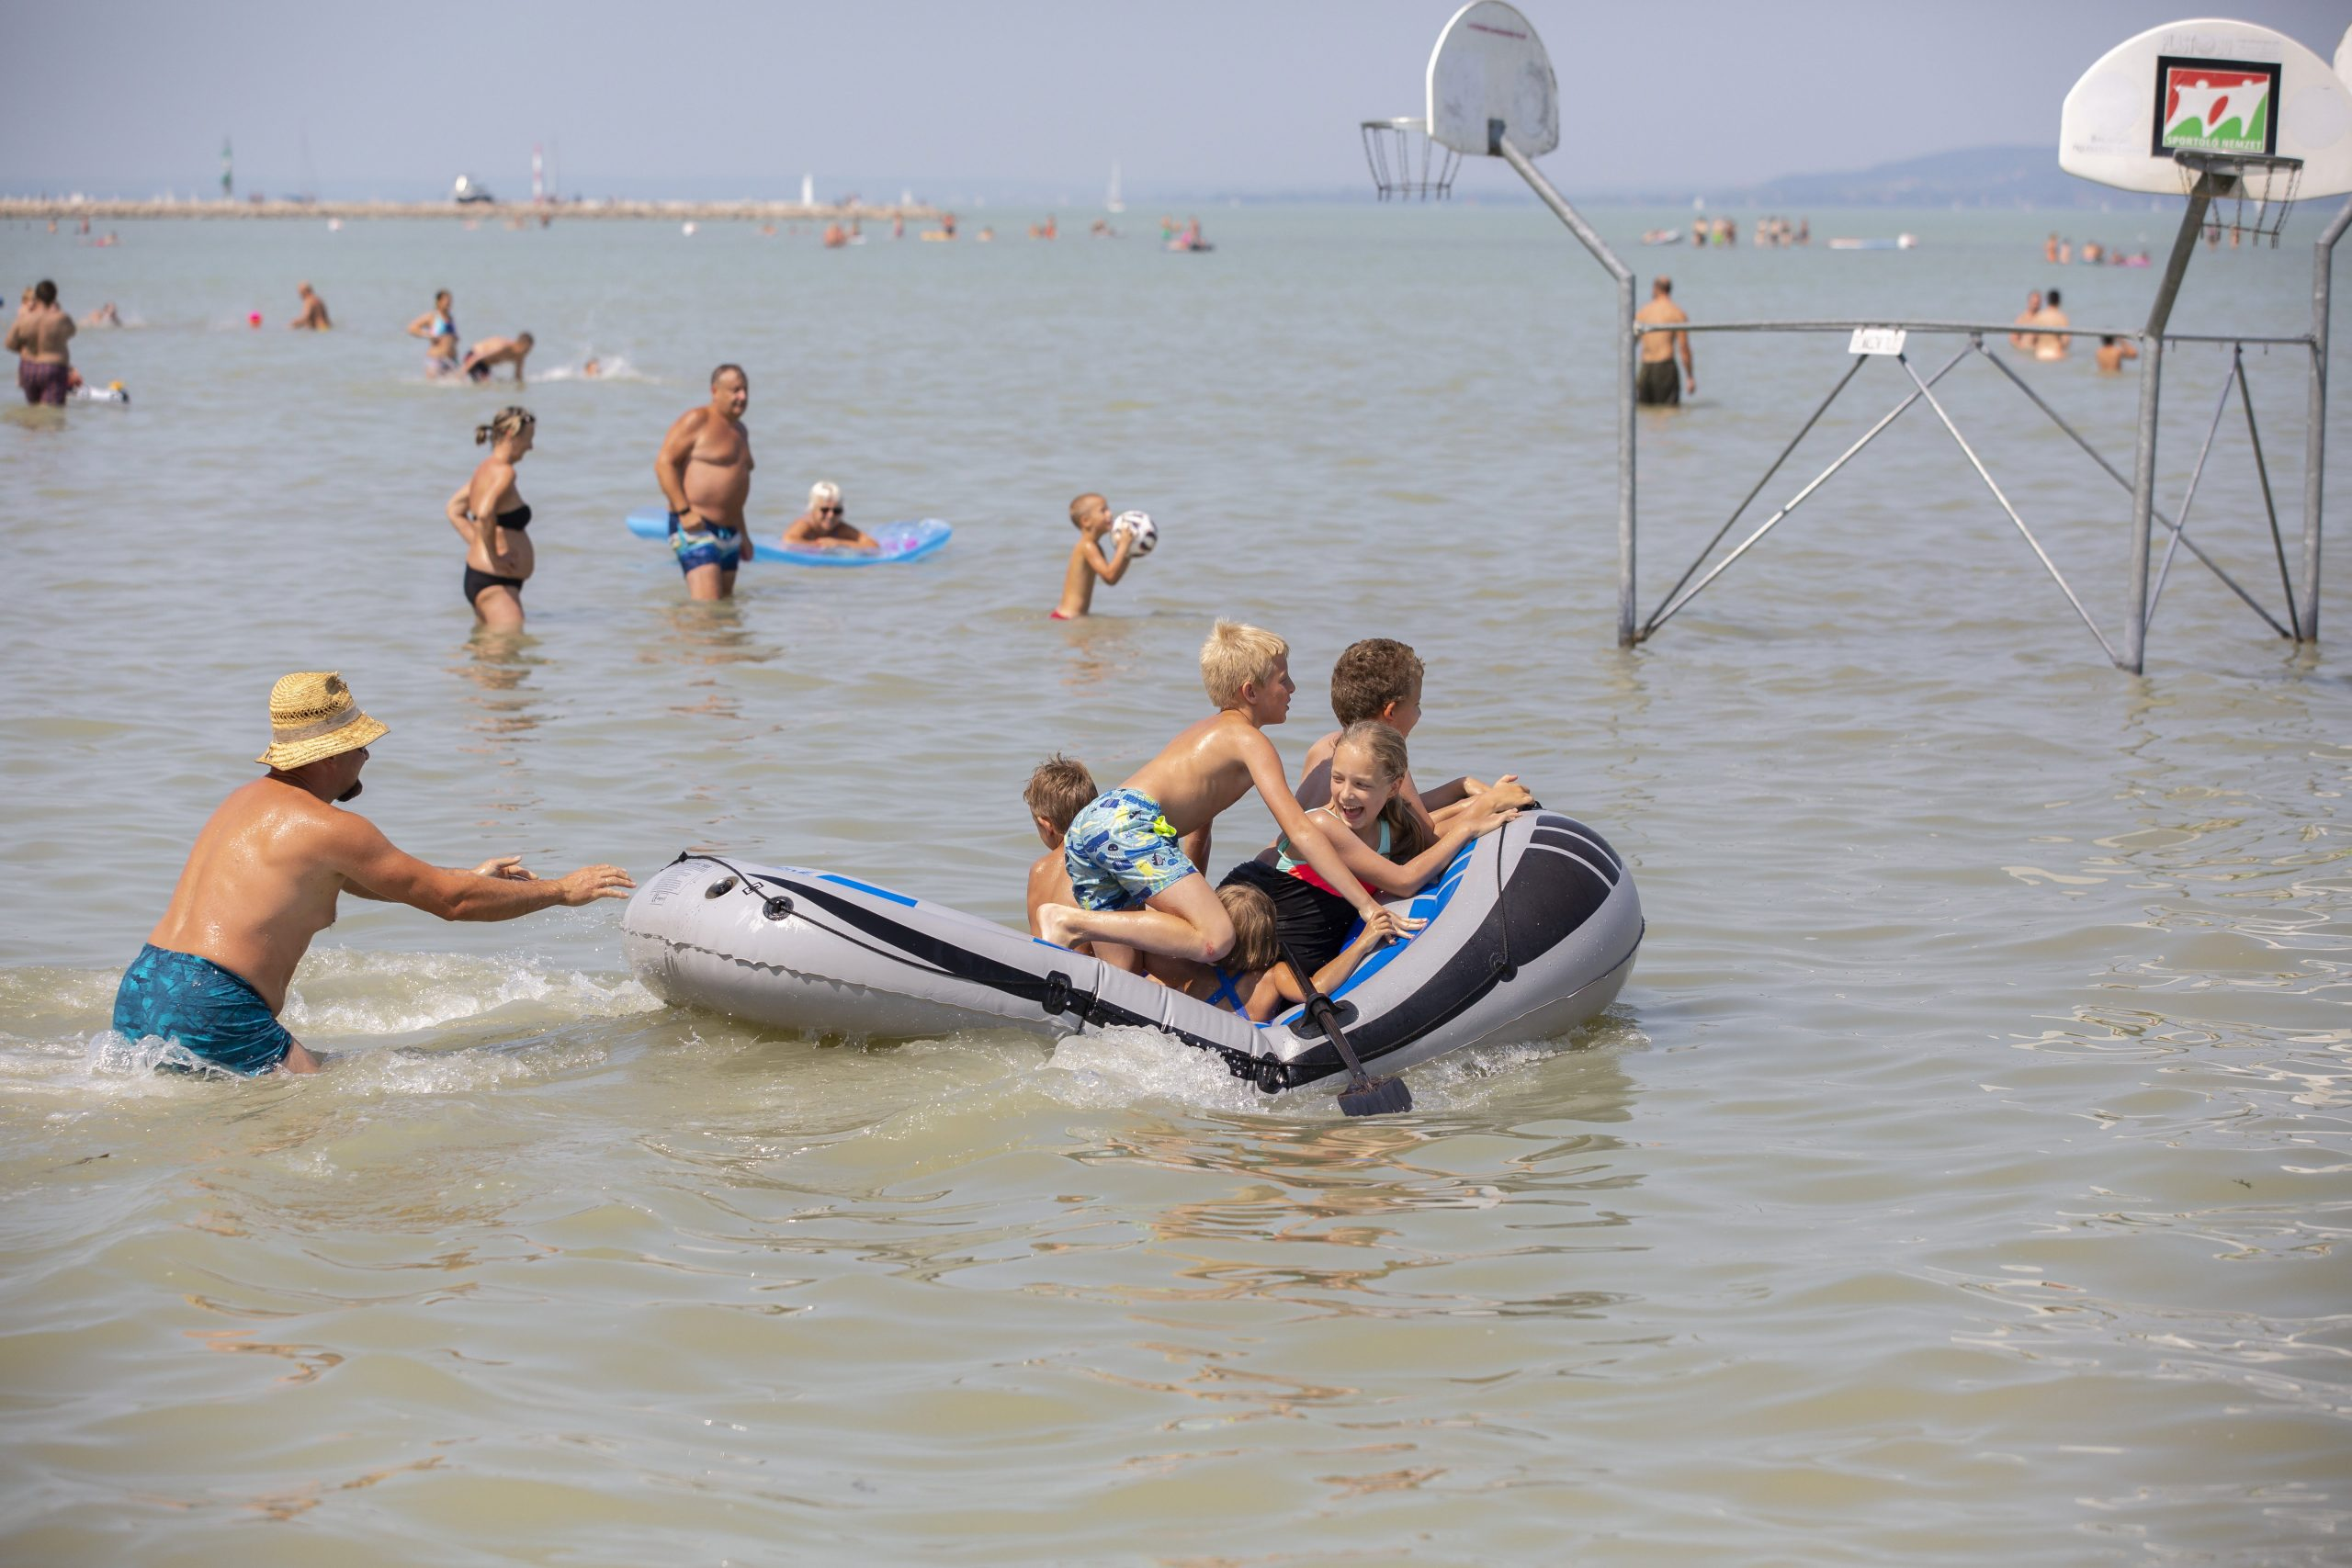 Coronavirus: Tourism May Re-Start in Summer, says Tourism Agency Head